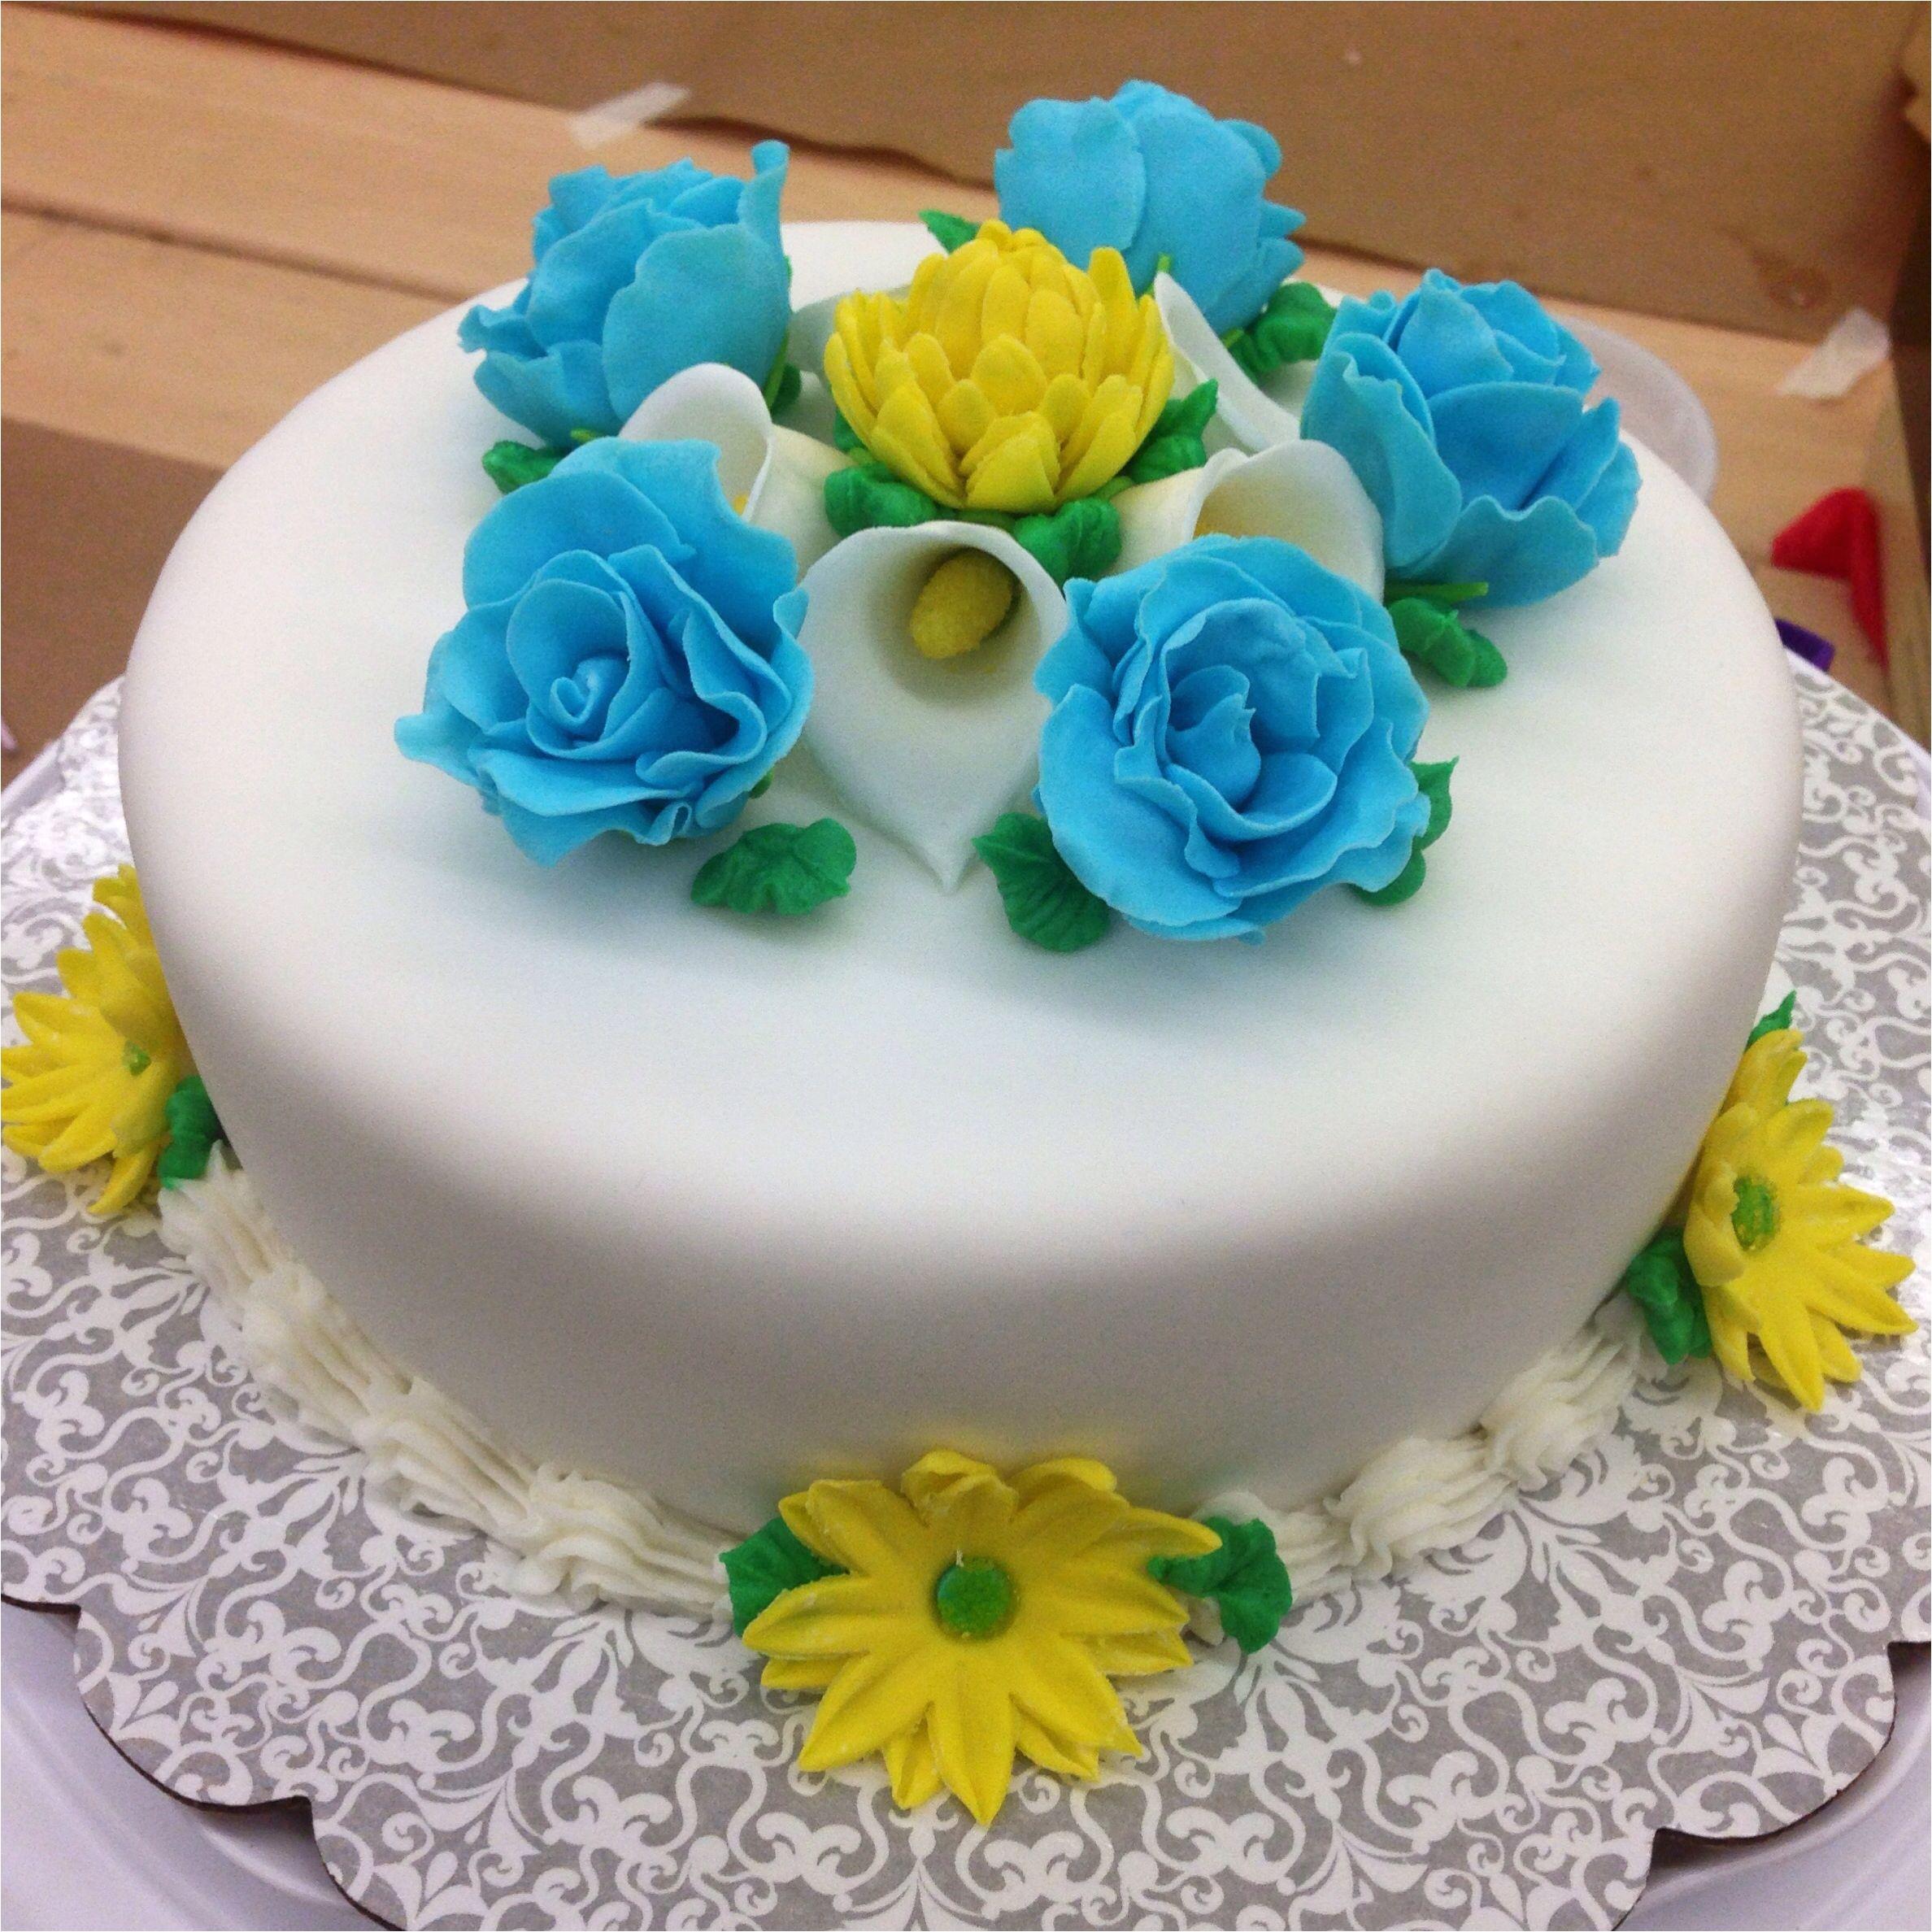 Wilton Cake Decorating Classes Near Me Rainbow Wedding Theme